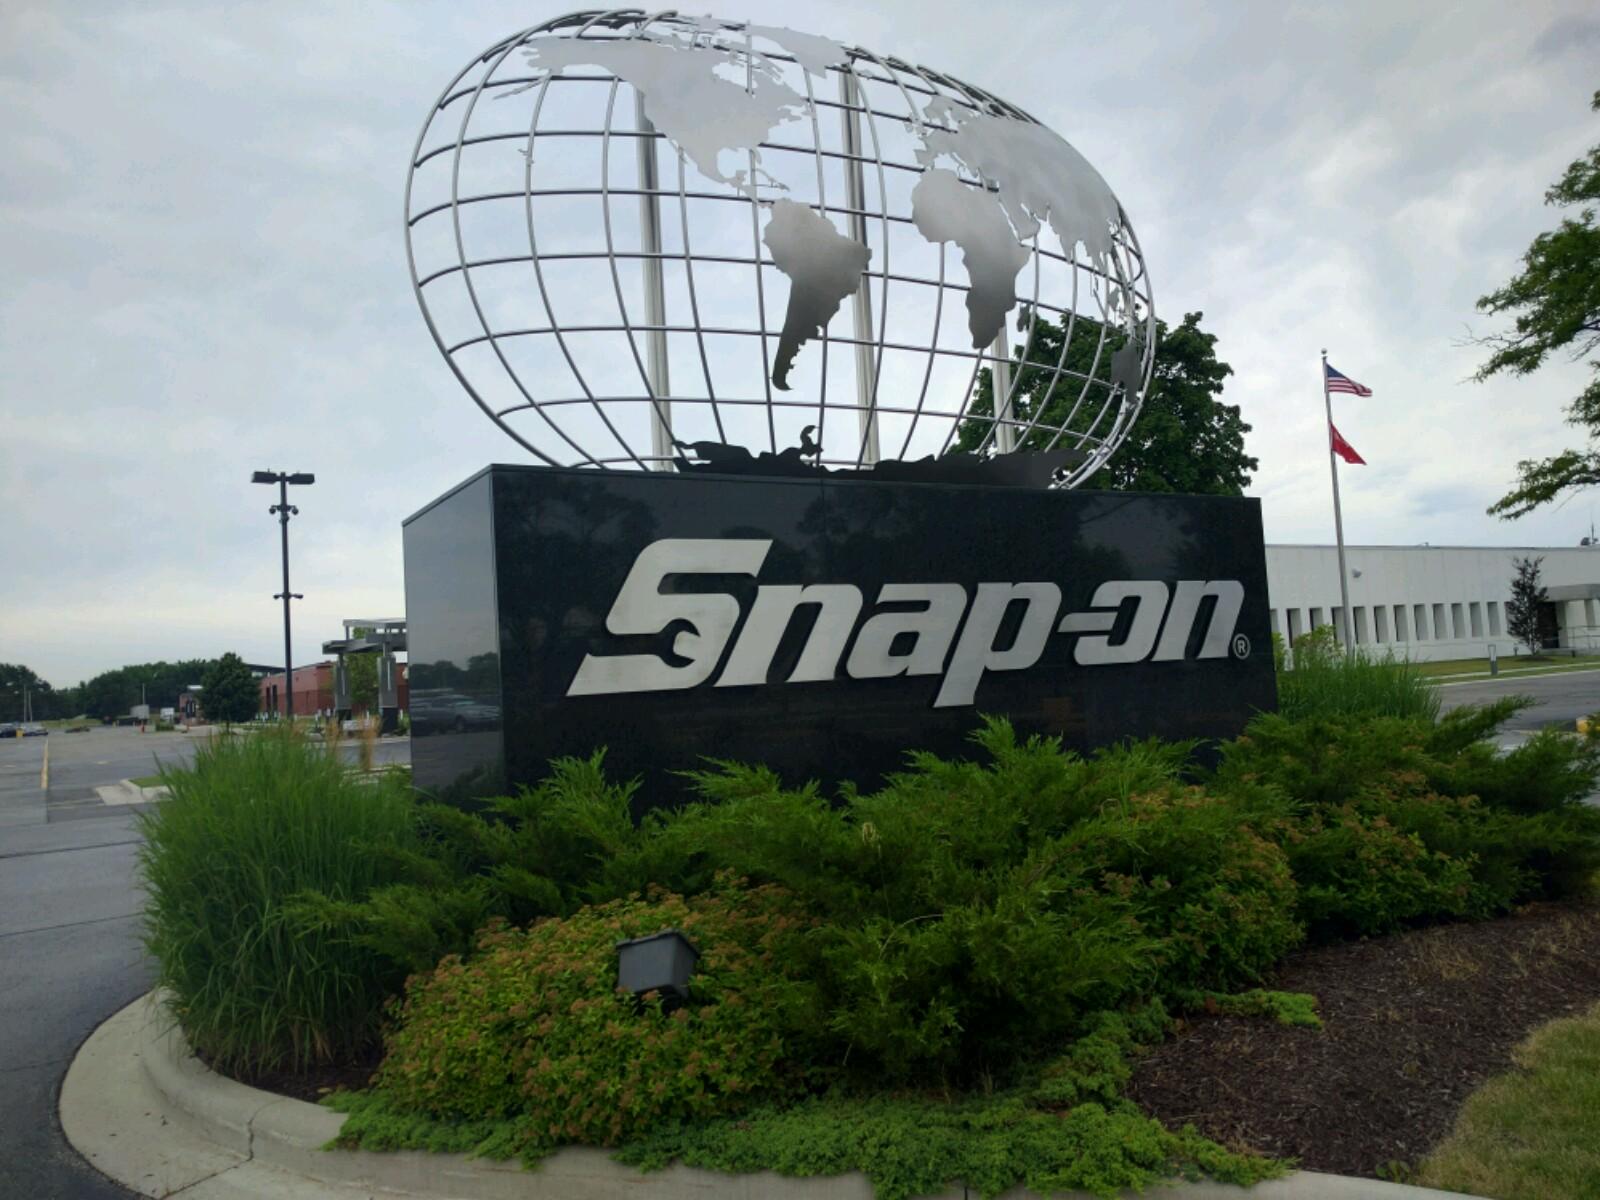 Entrance to Snap-on's corporate headquarters in Kenosha, Wisconsin.